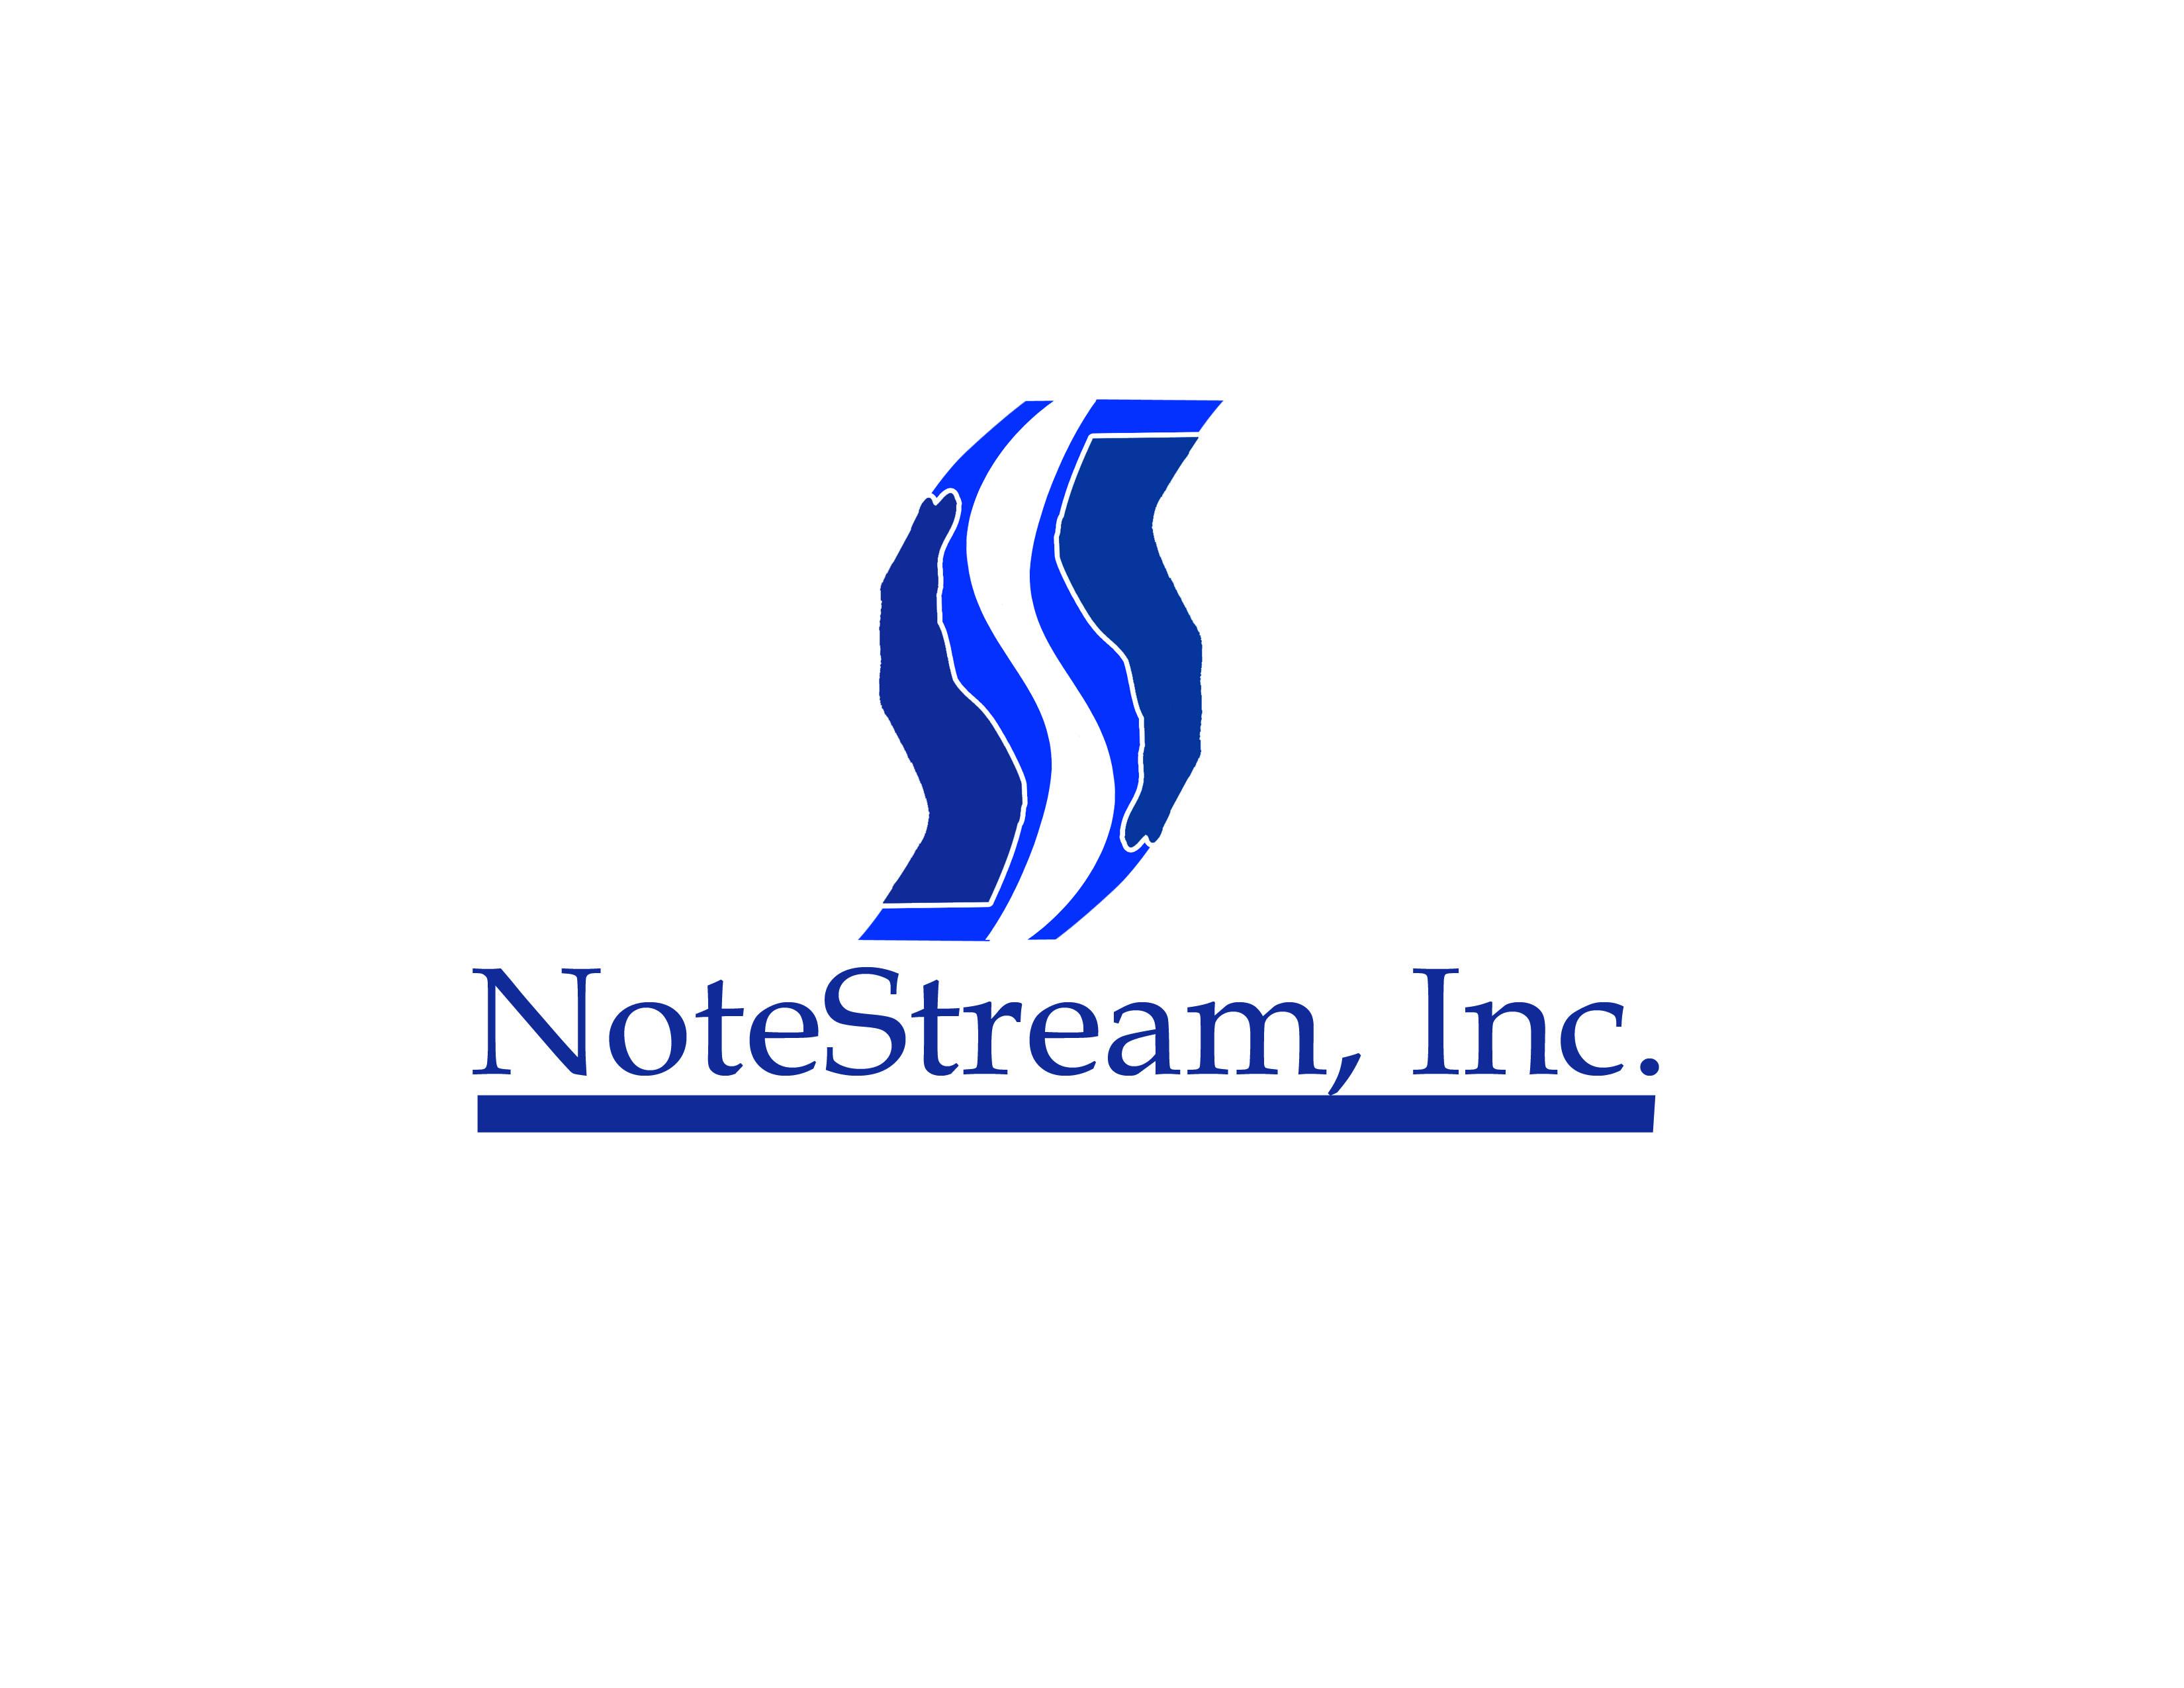 Logo Design by Alan Esclamado - Entry No. 3 in the Logo Design Contest Imaginative Logo Design for NoteStream.